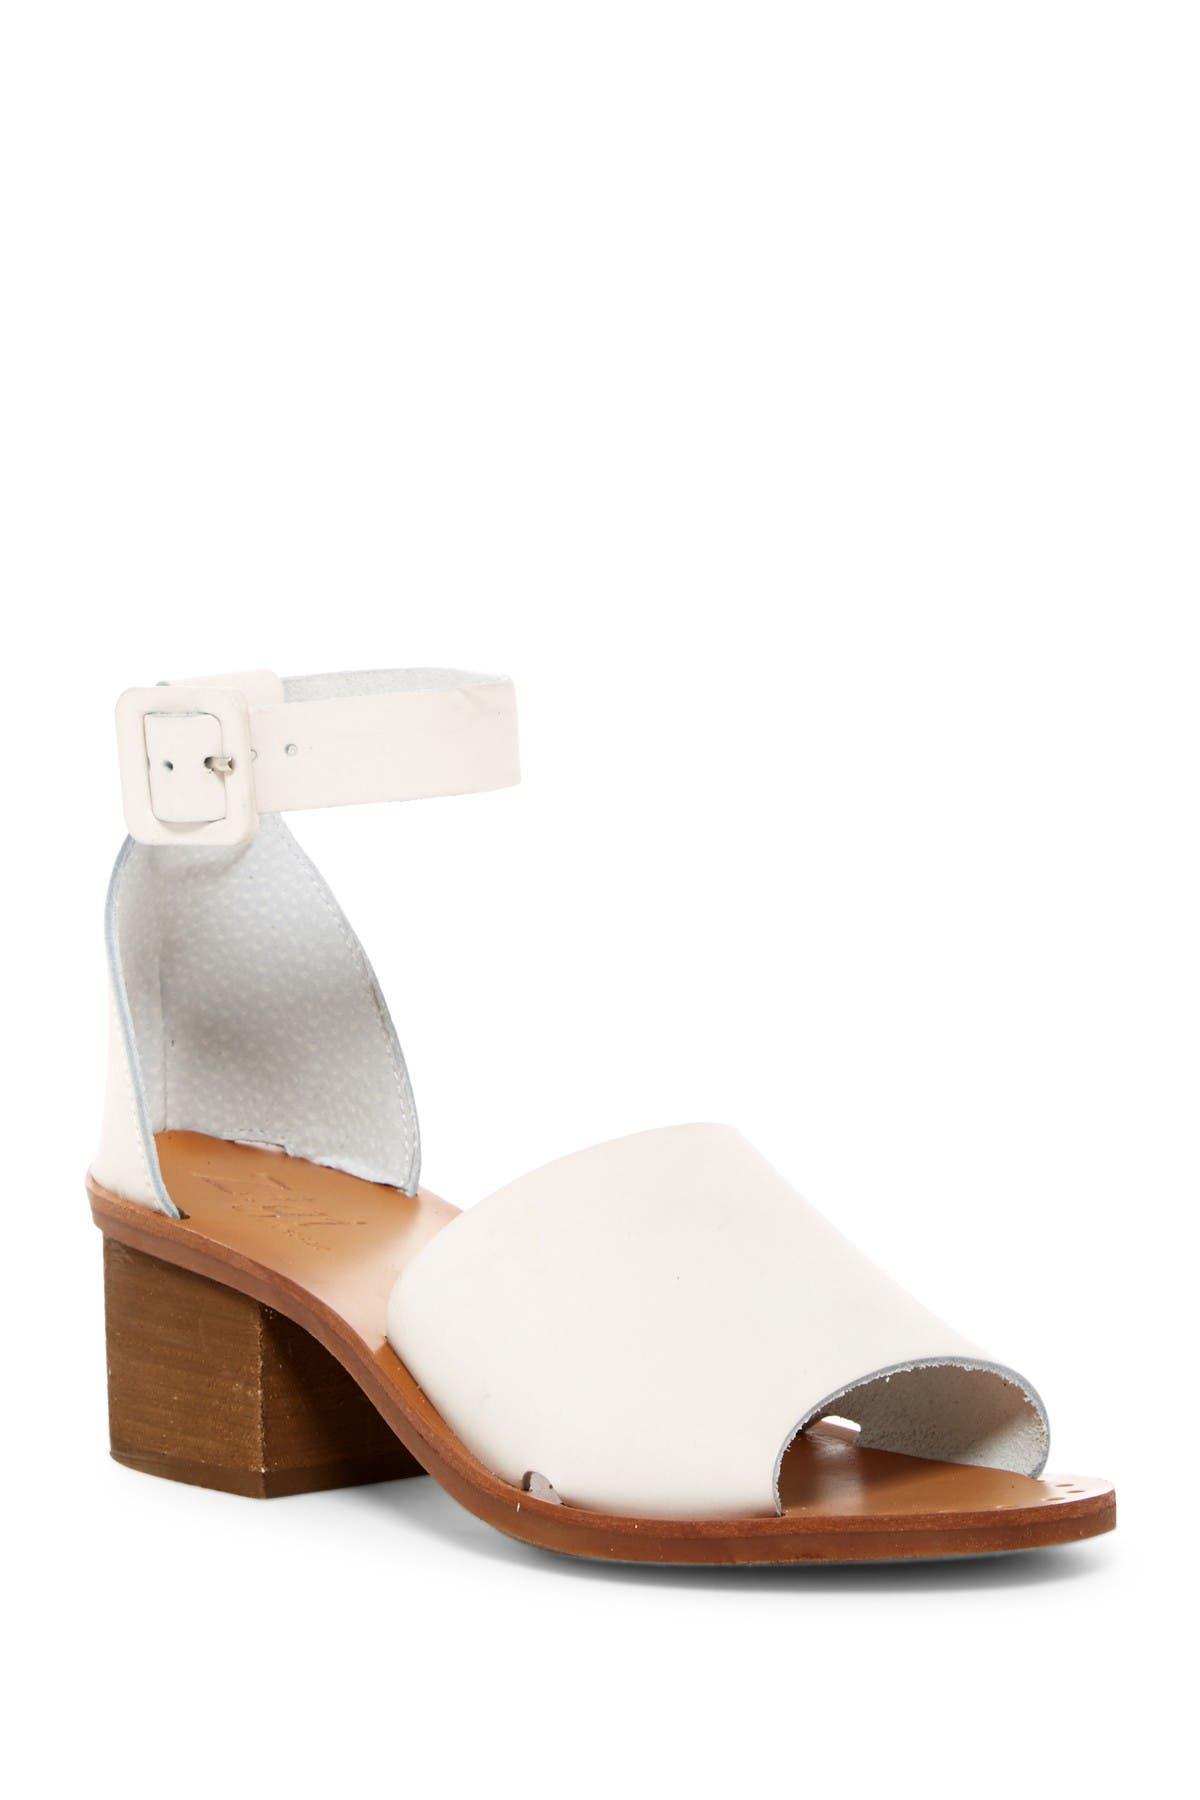 Image of Zigi Soho Annalisa Open Toe Sandal